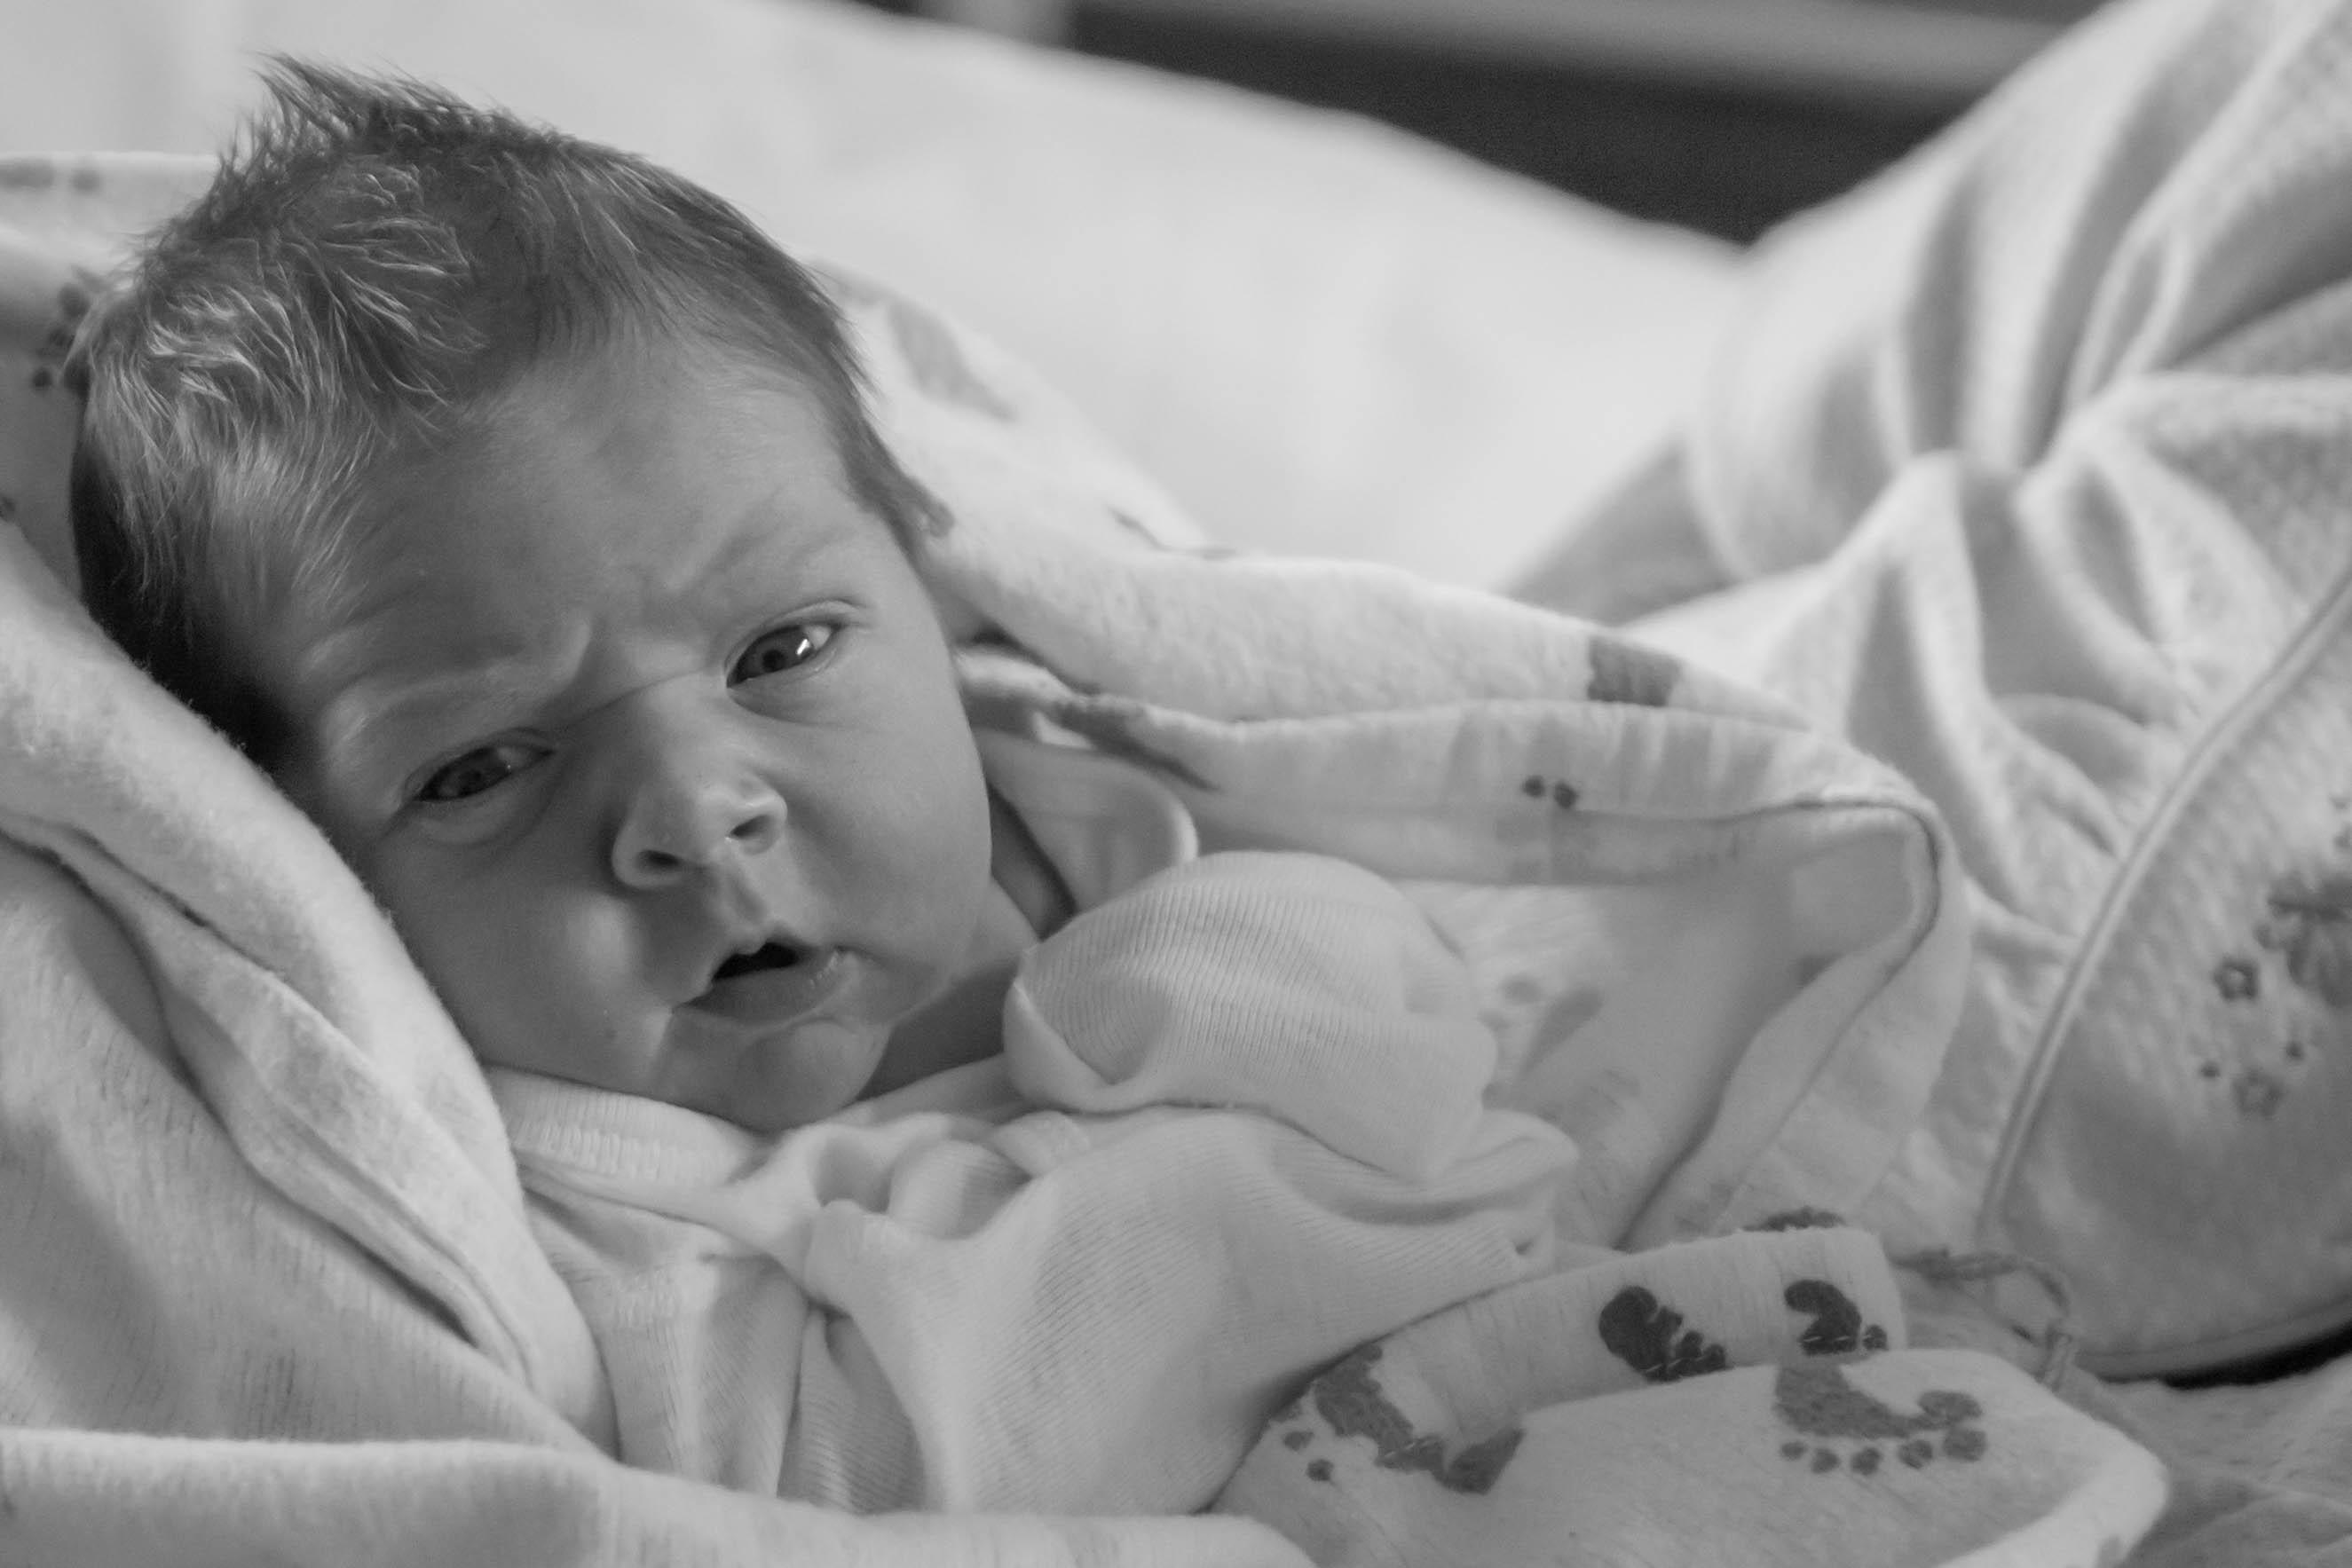 new baby hospital photos